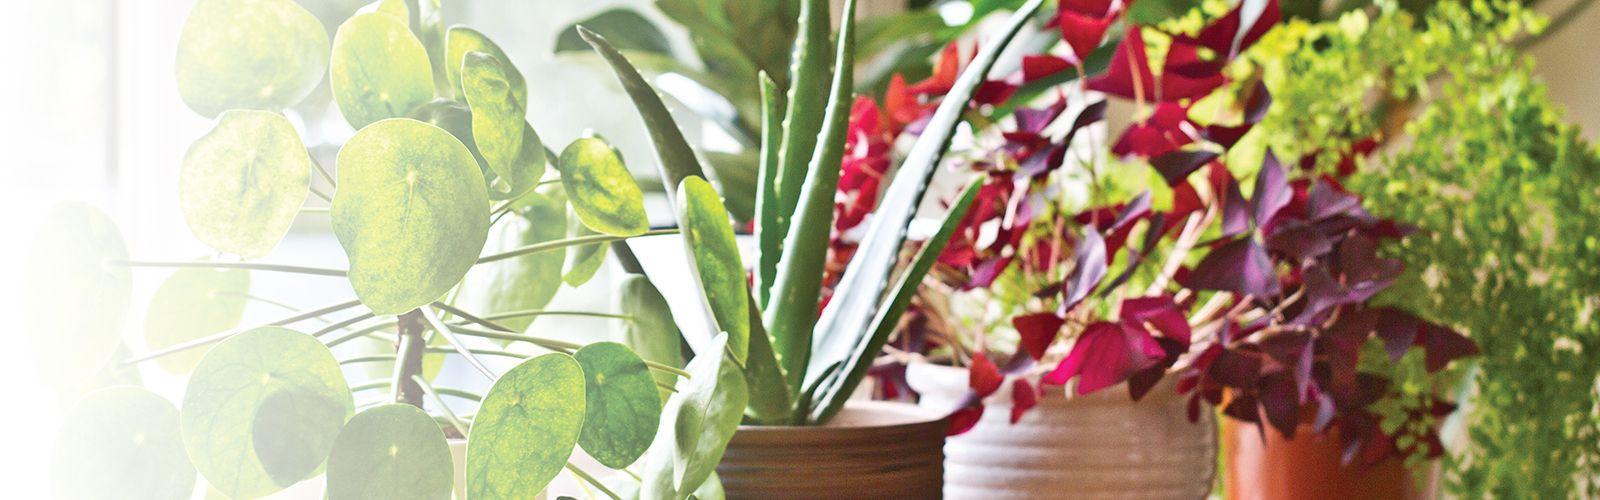 houseplants in a row